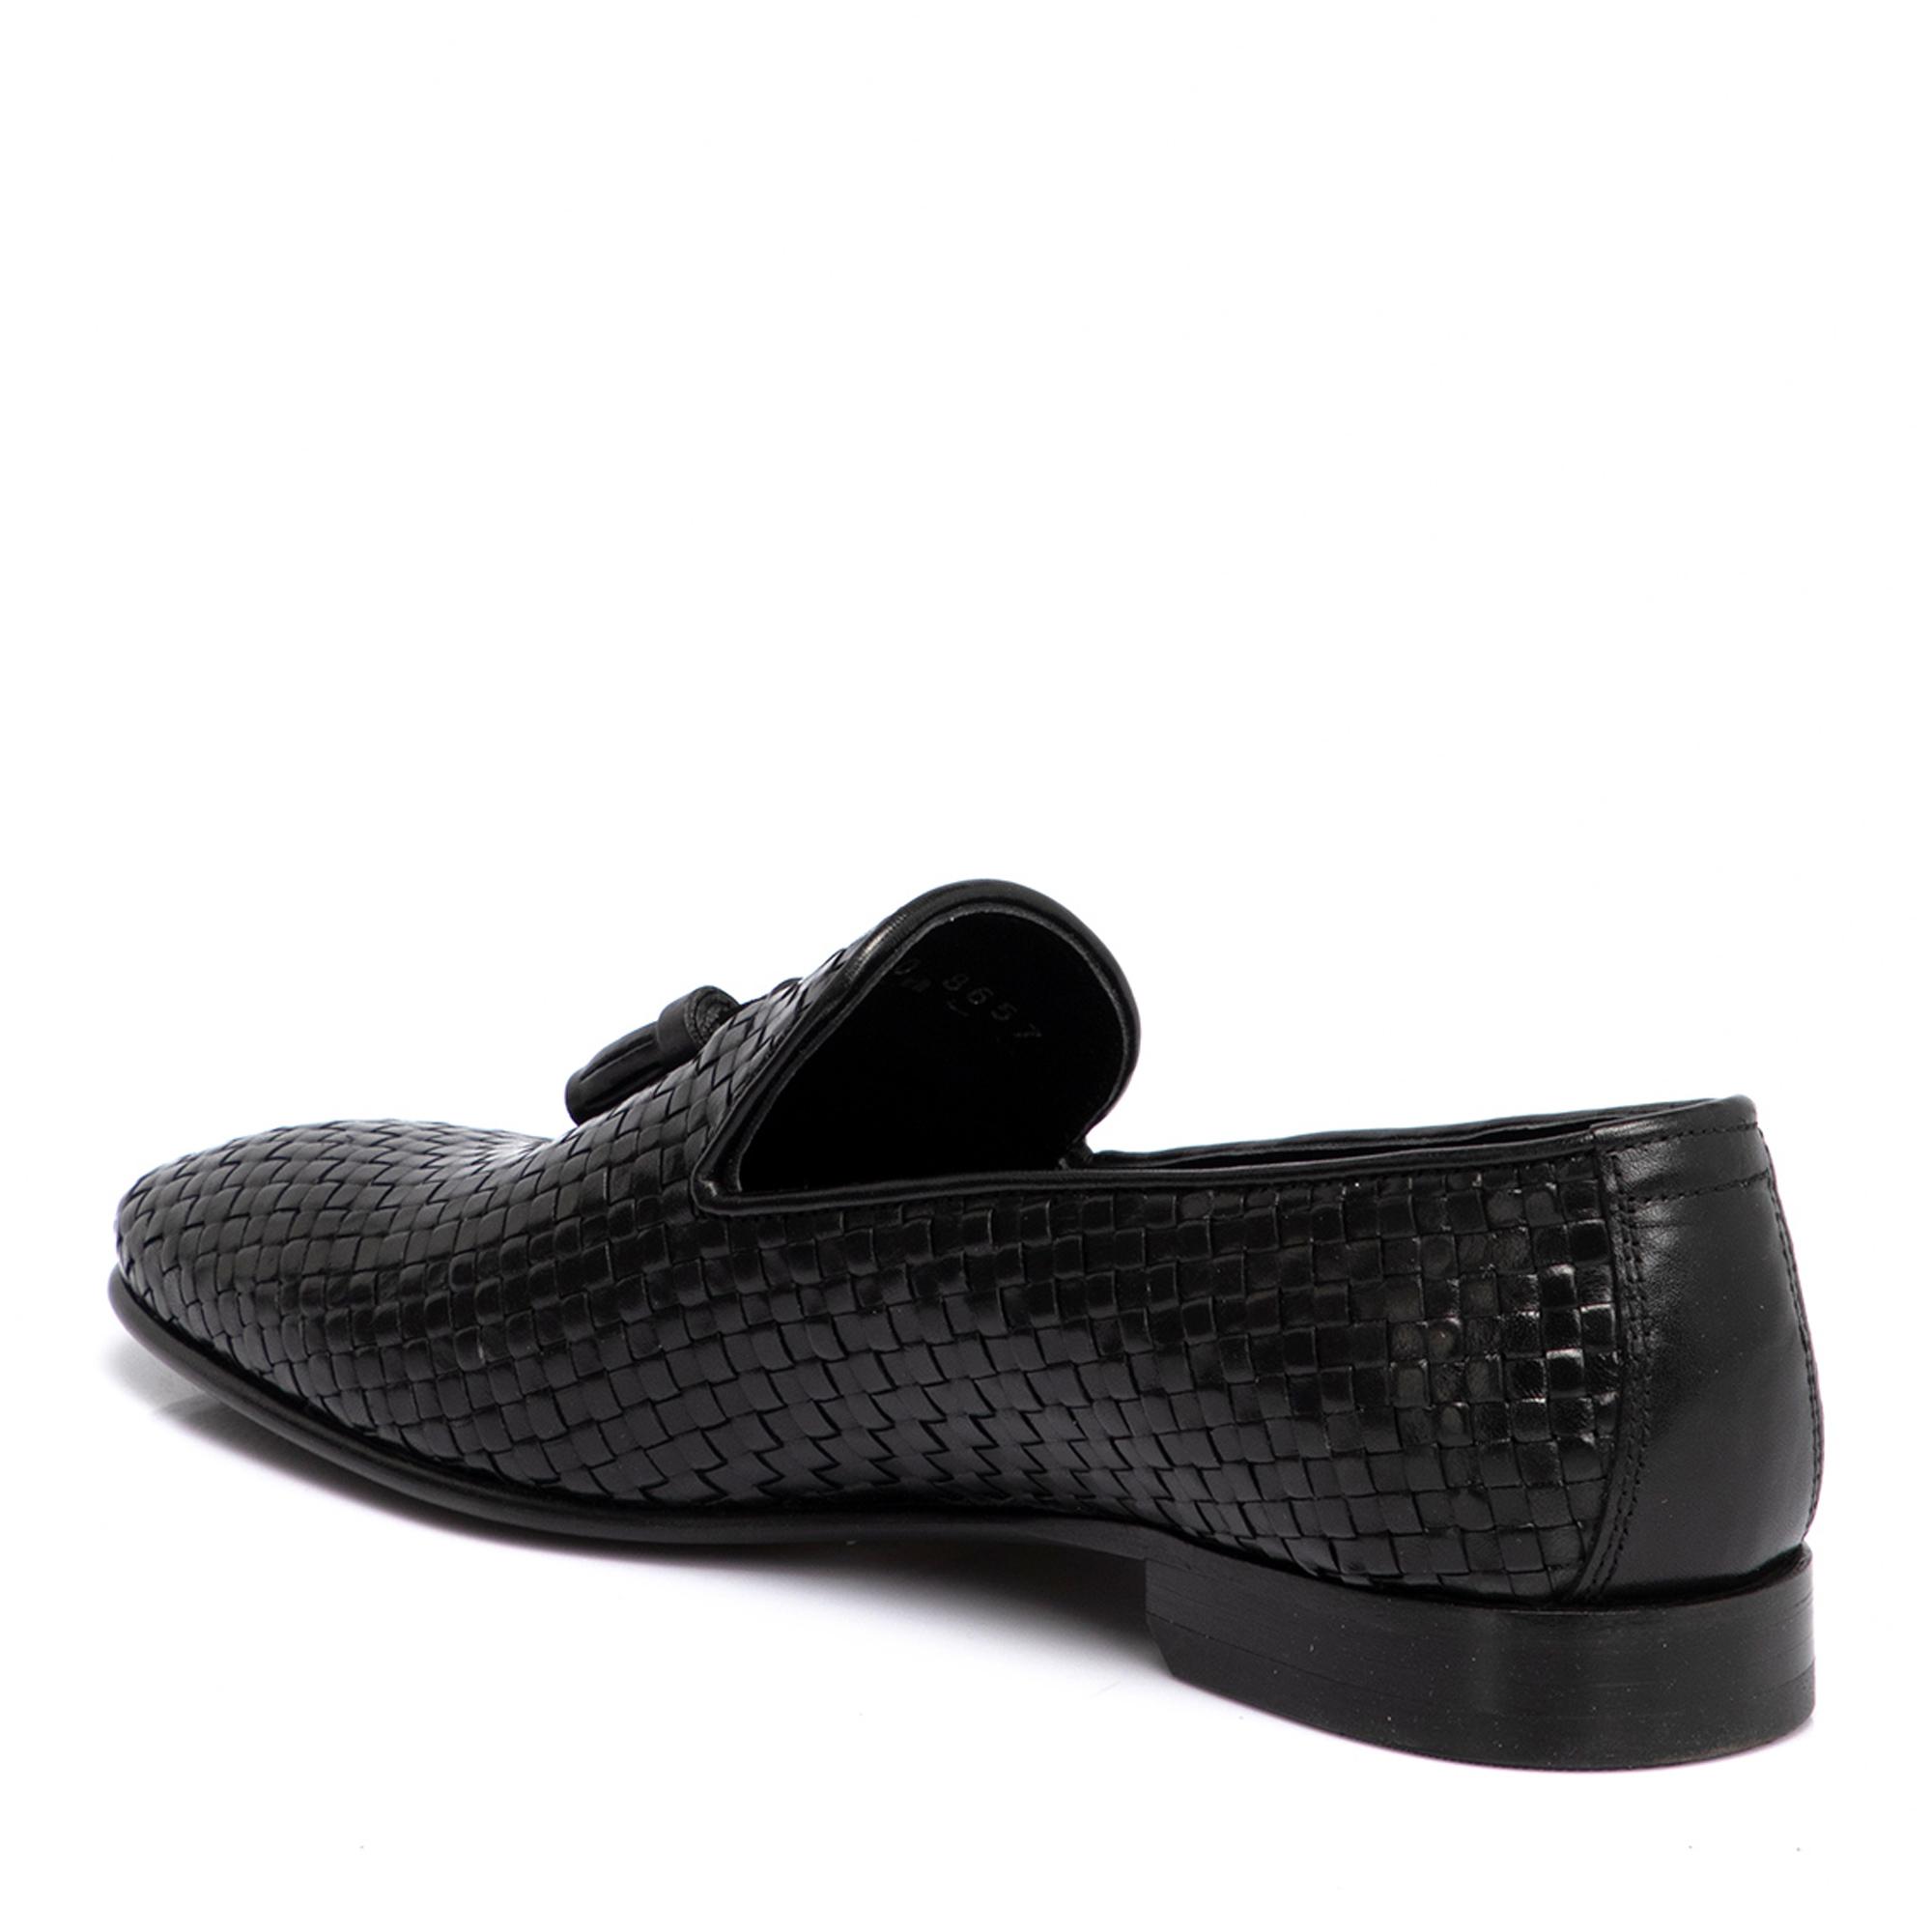 Siyah Deri Erkek Ayakkabı 54293B9N